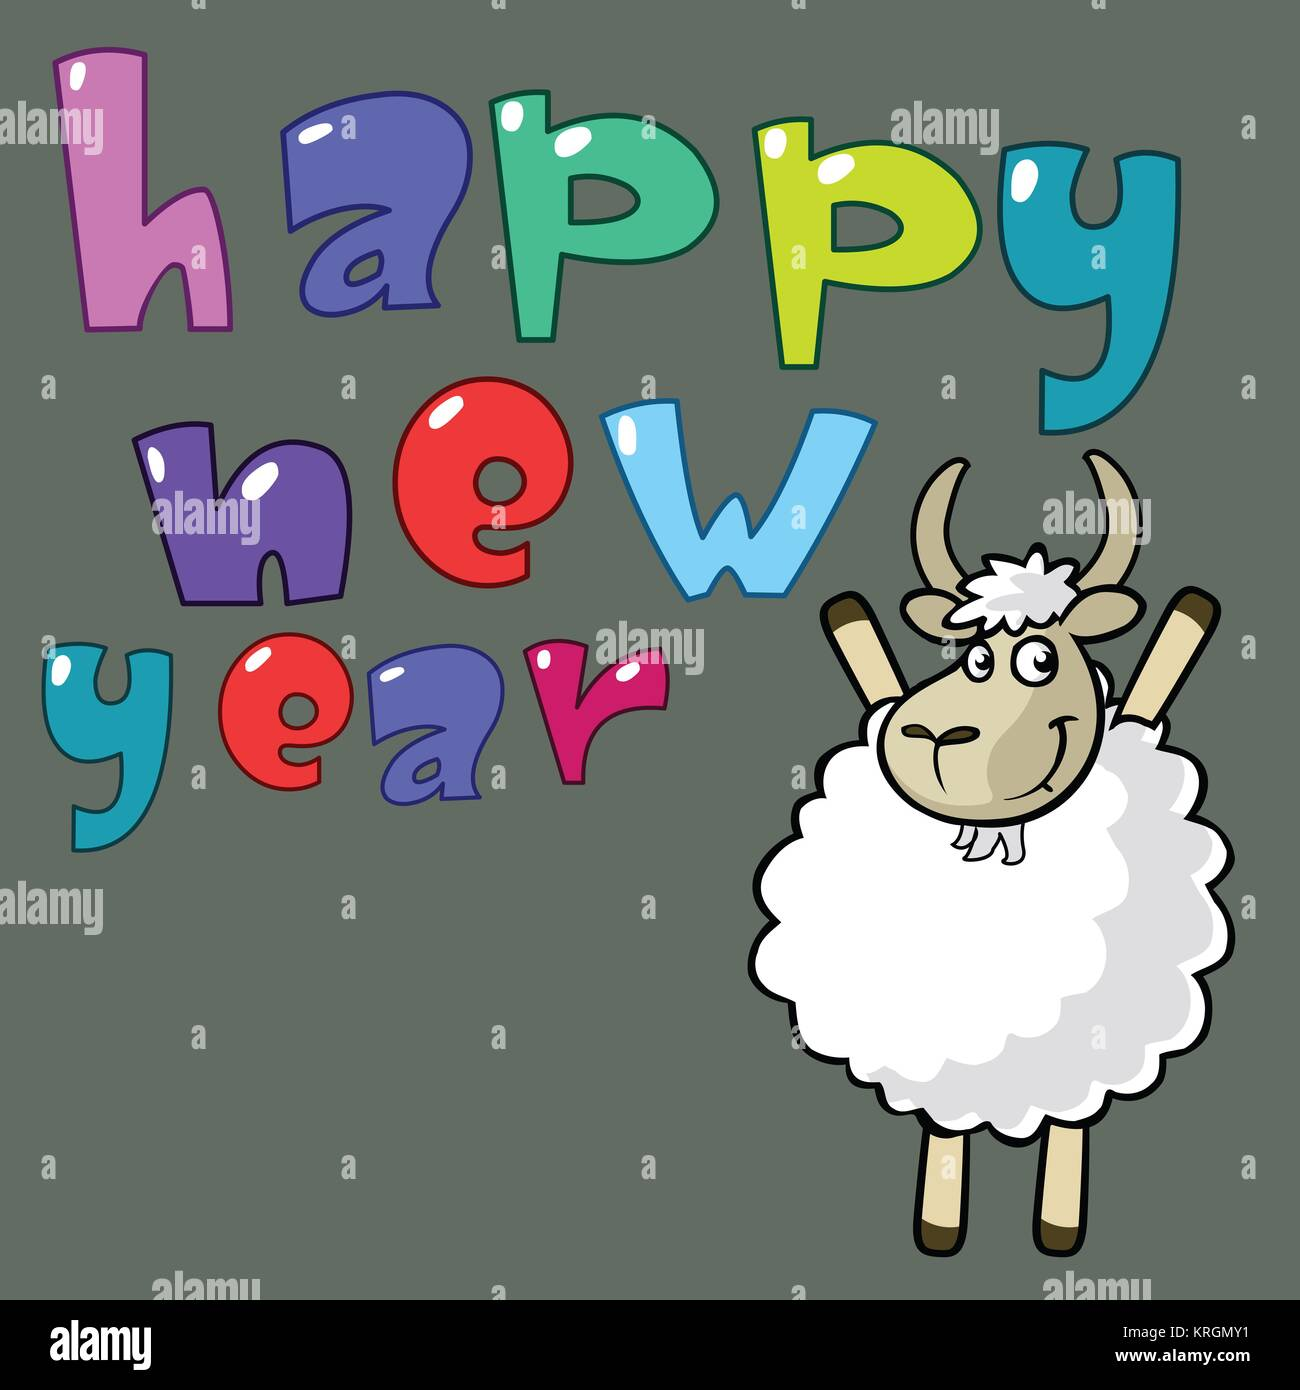 2015 happy new year stock image